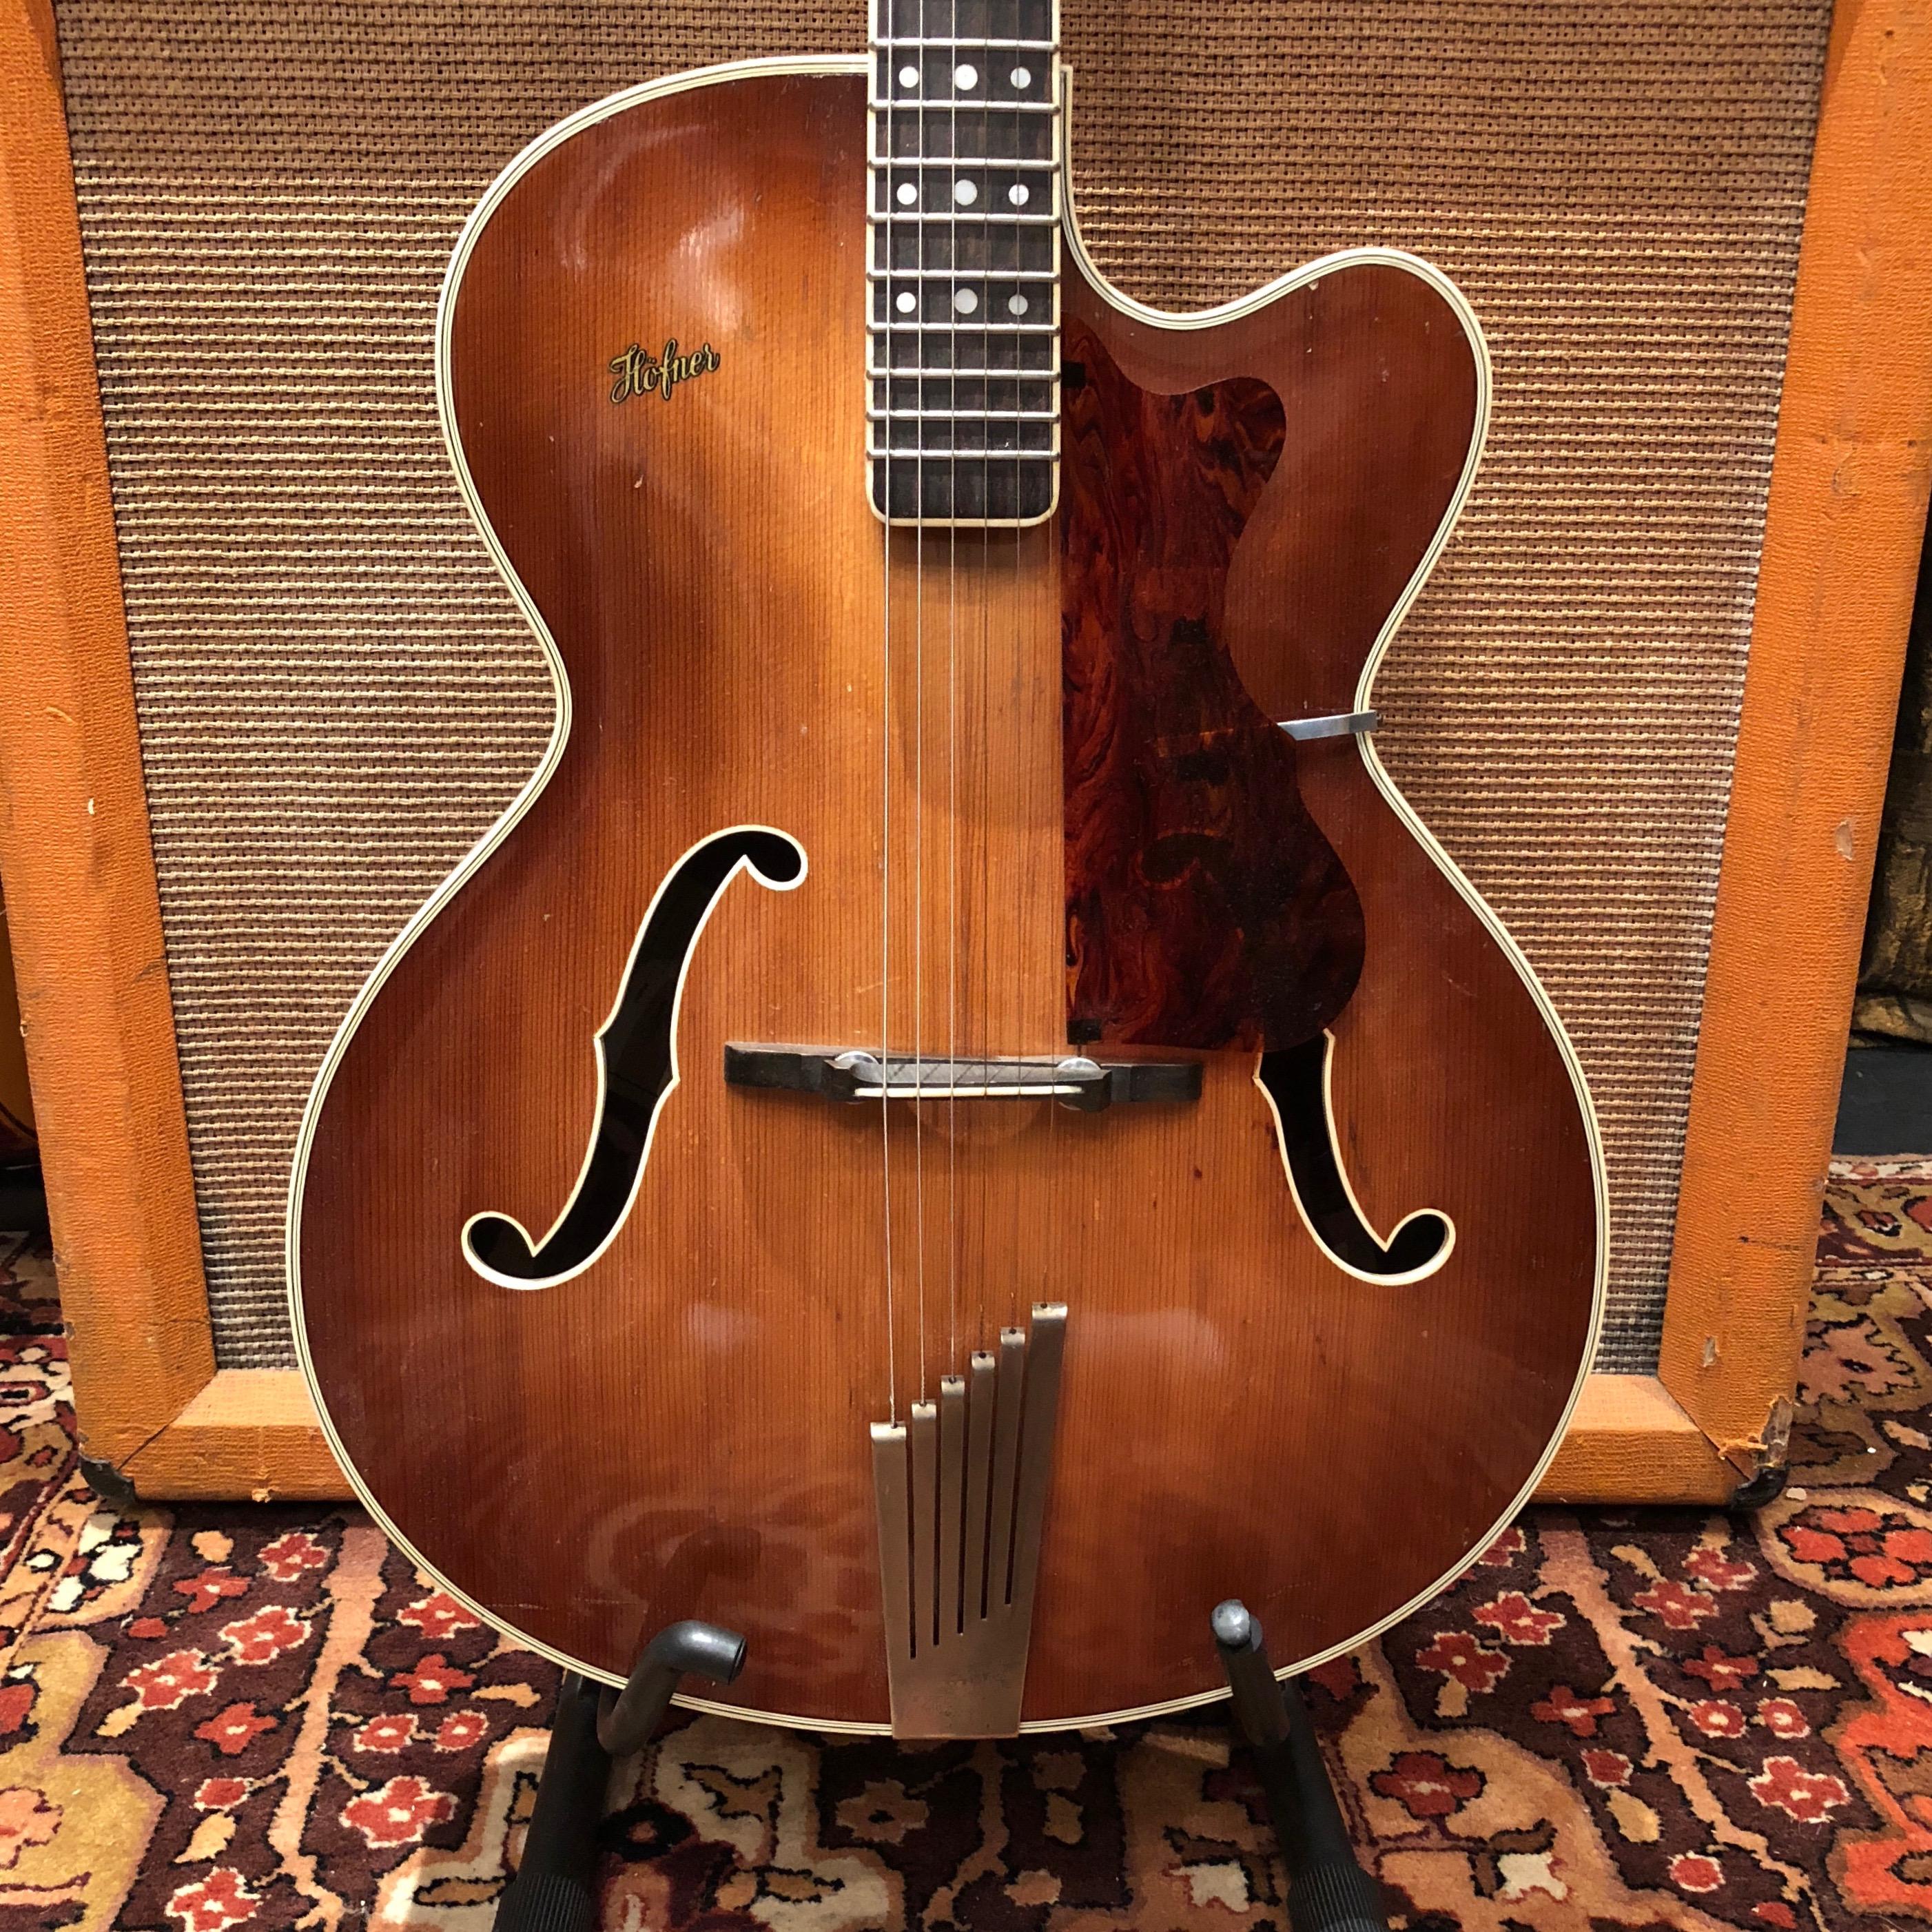 Vintage 1960 Hofner President Acoustic Archtop Brunette Rosewood Hollow Guitar